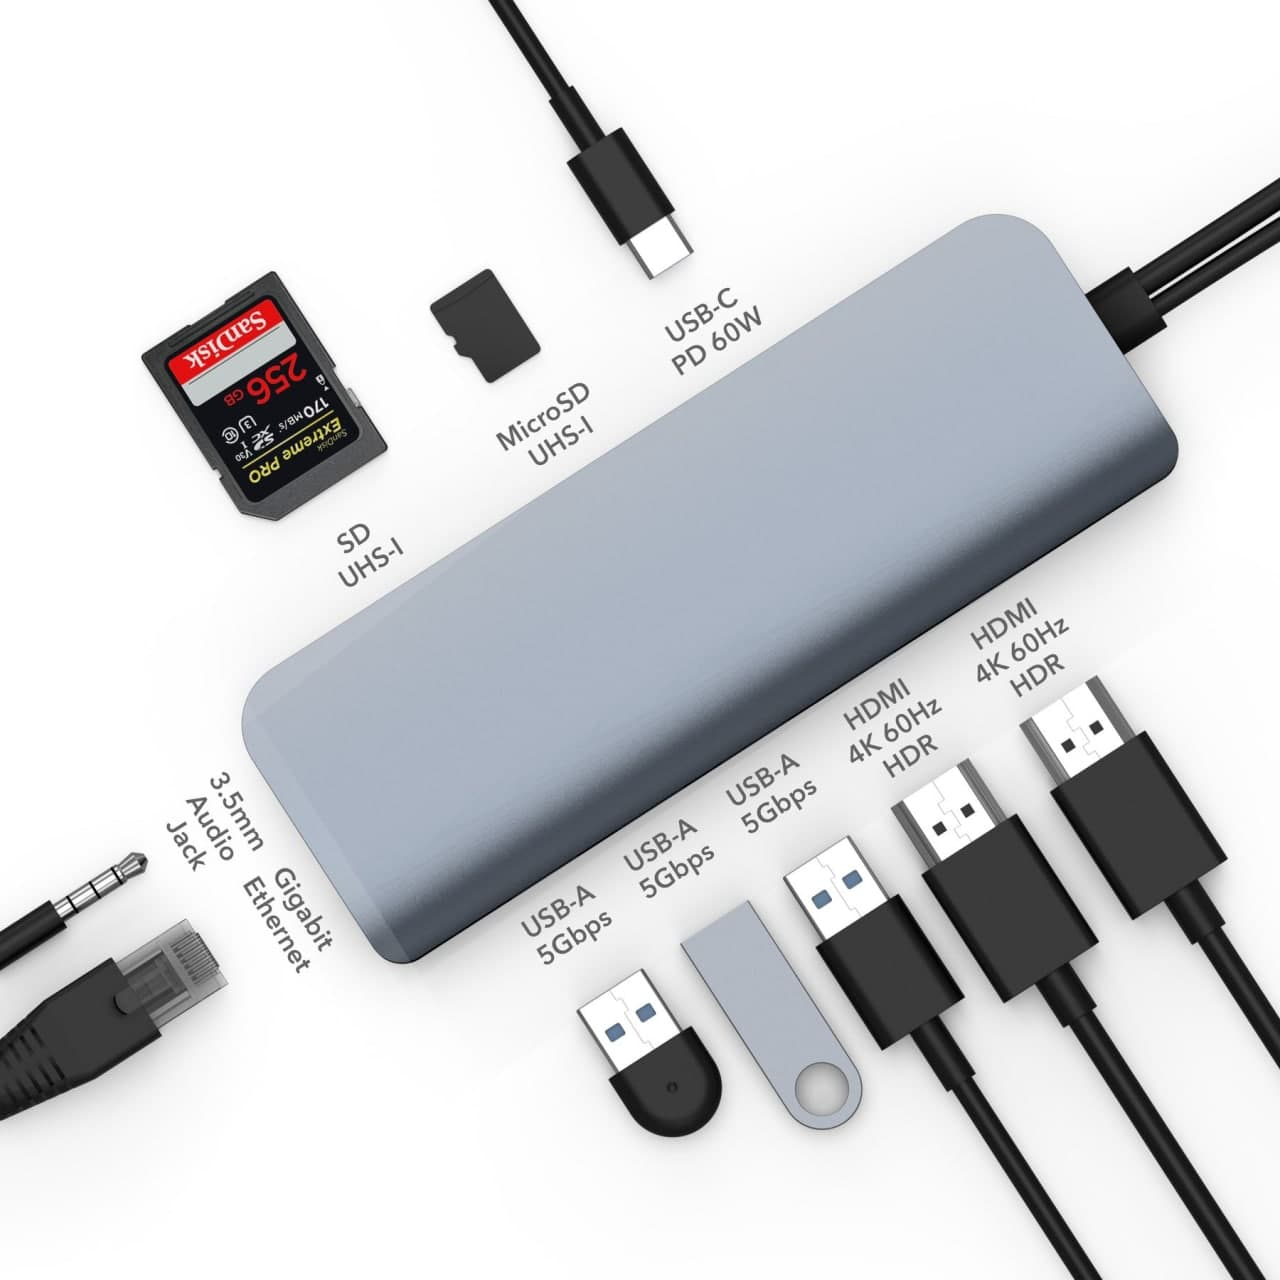 cong-chuyen-hyperdrive-viber-10-in-2-4k60hz-usb-c-hub-for-macbook-ipadpro-laptop